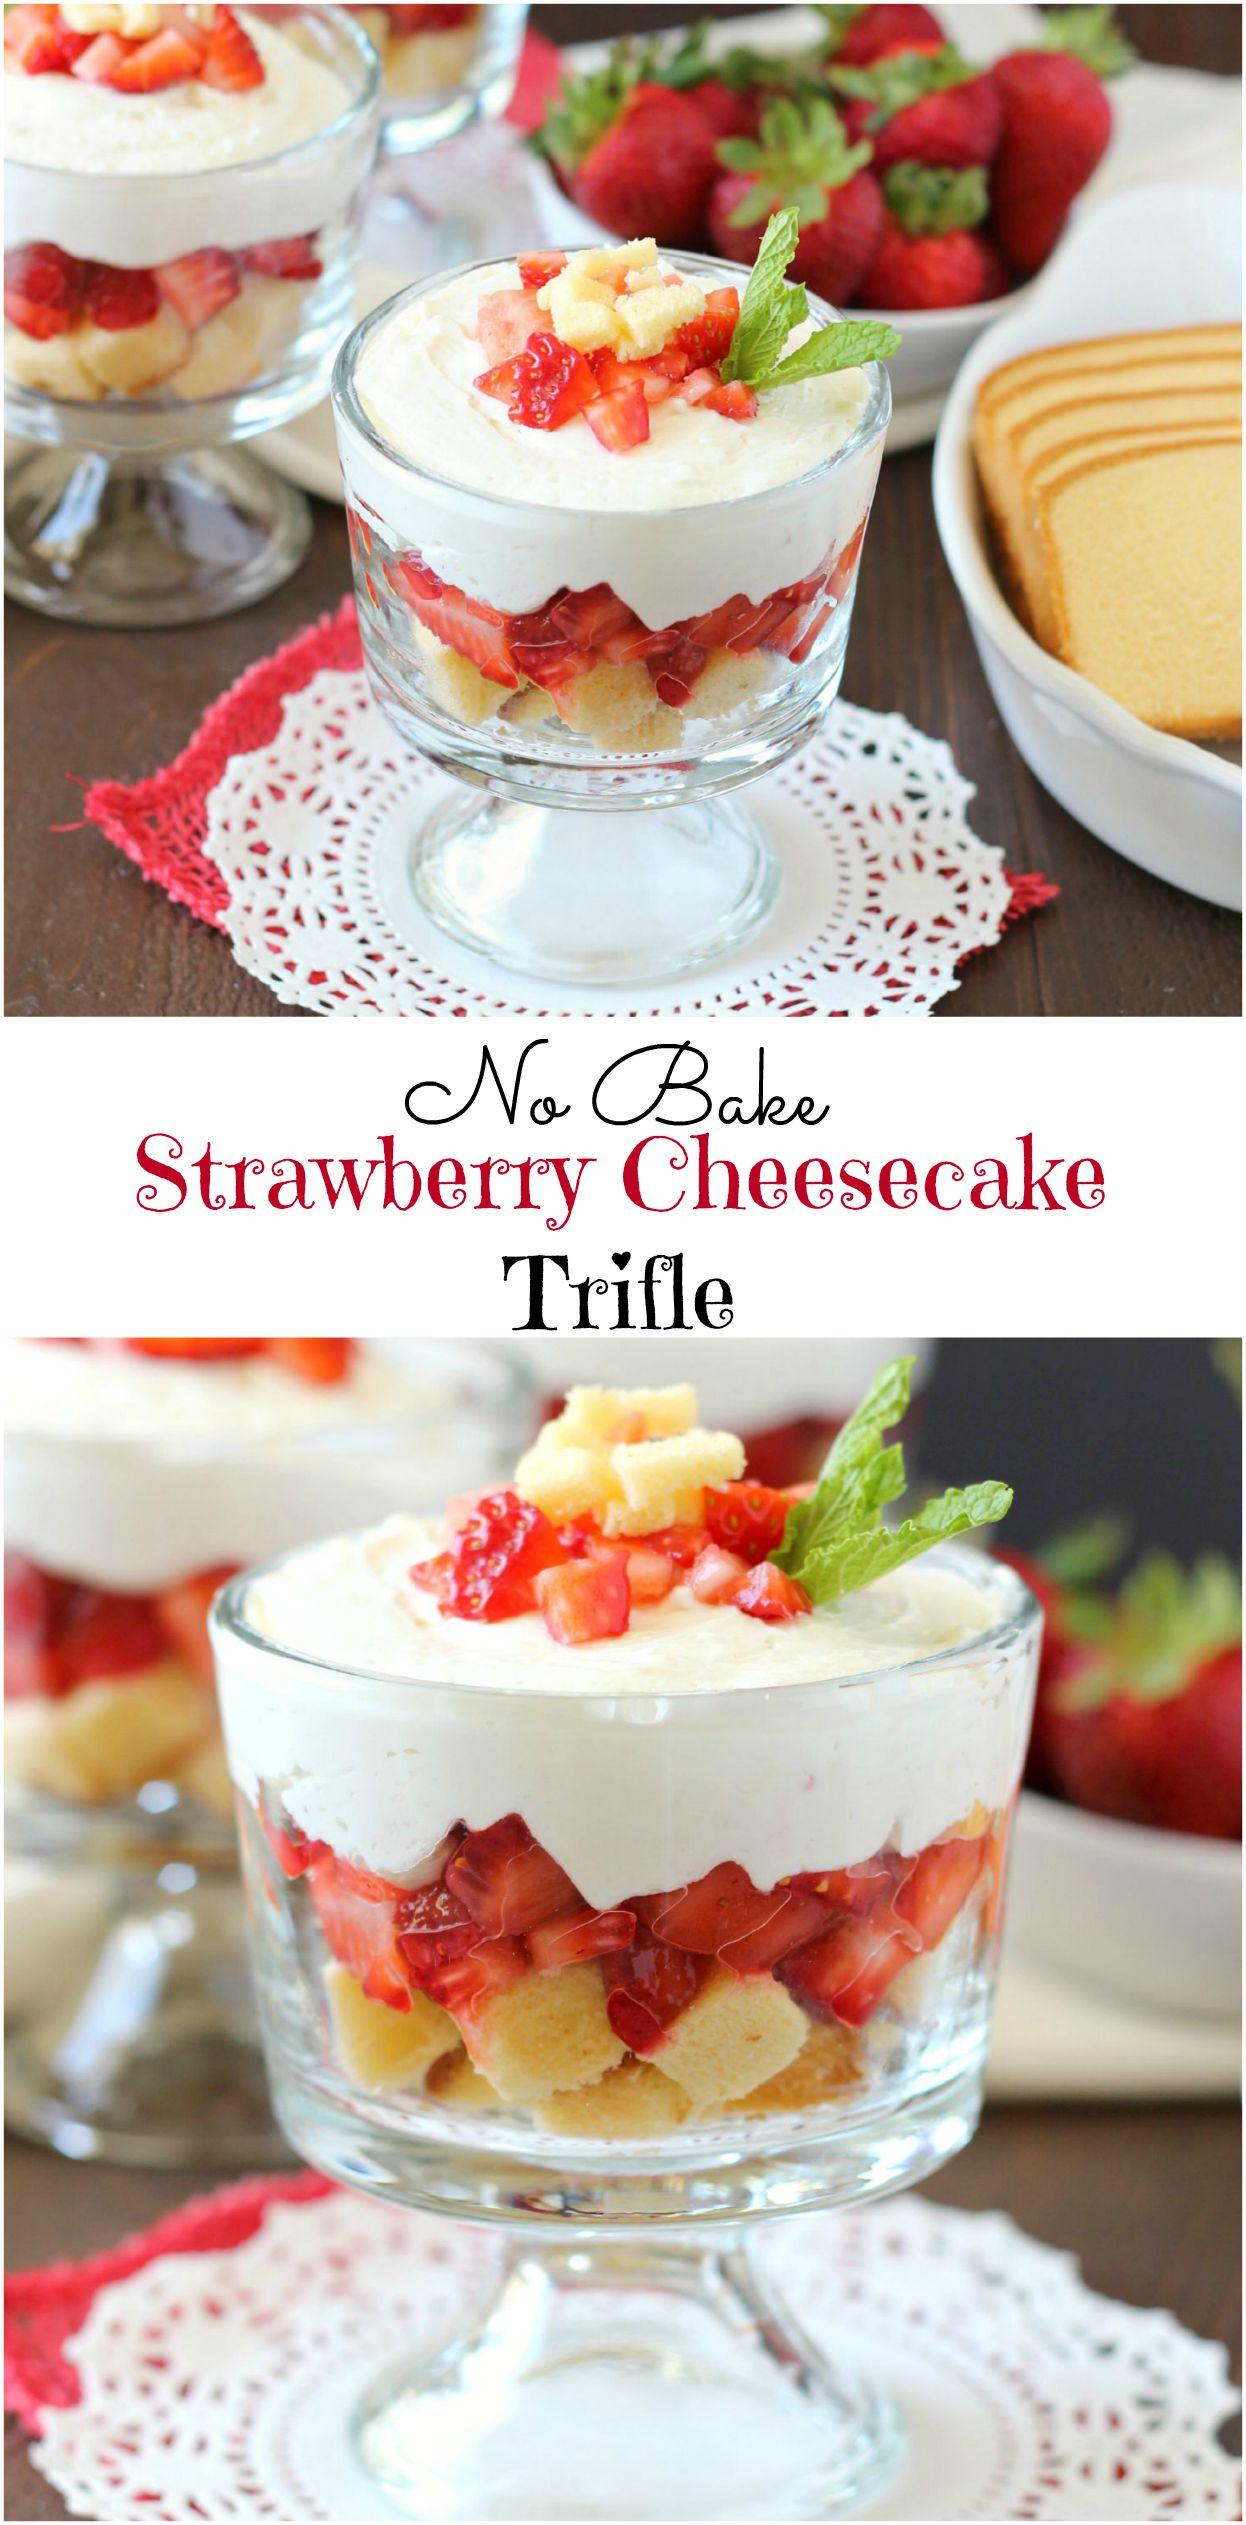 No Bake Strawberry Cheesecake Trifle ~ mykitchencraze.com